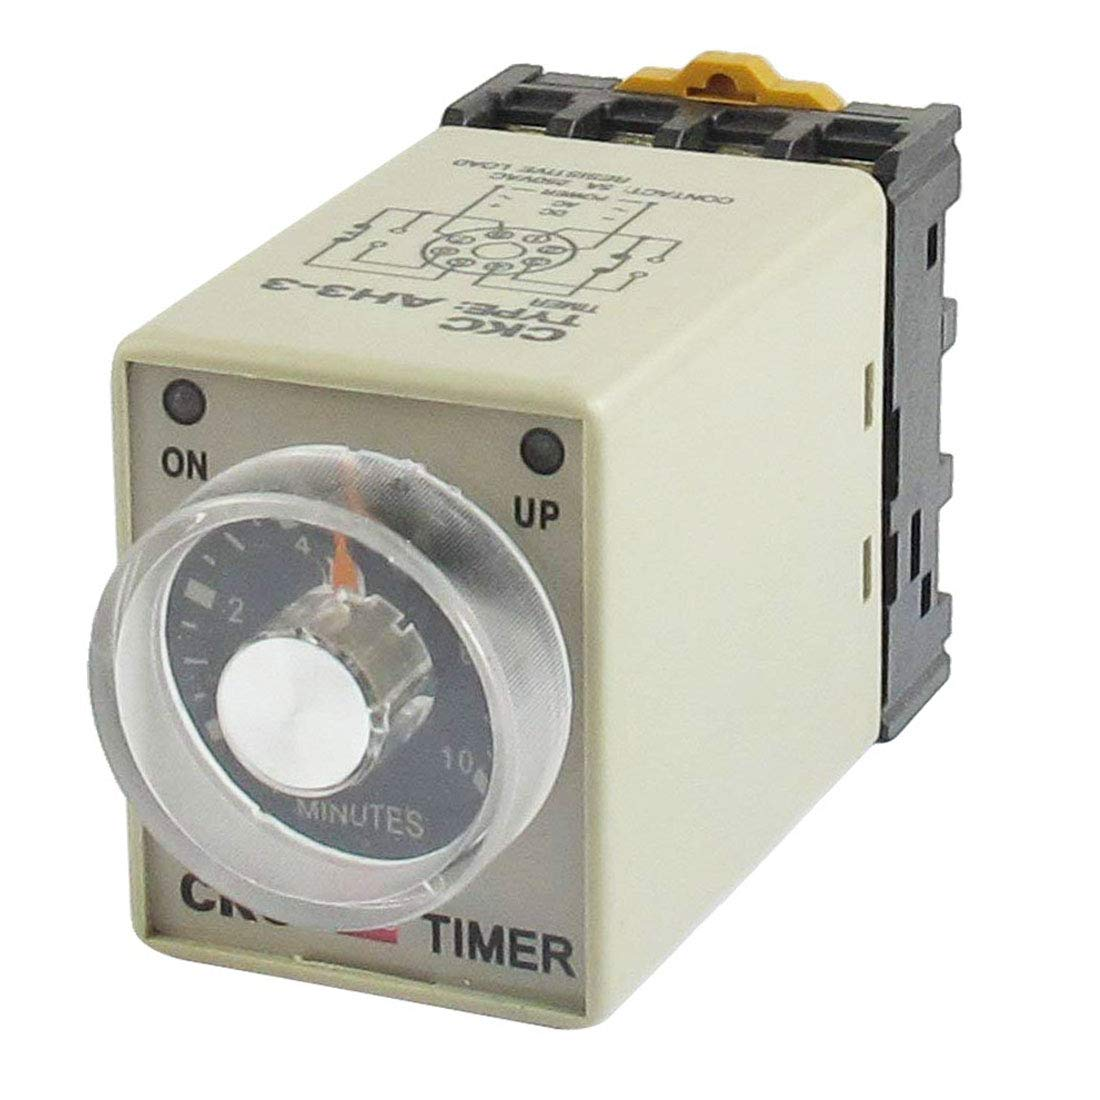 Aodesy AH3-3 Adjustable Time Relay Base Resistive Load Delay Timer Relay Time Range 0-60 Minutes